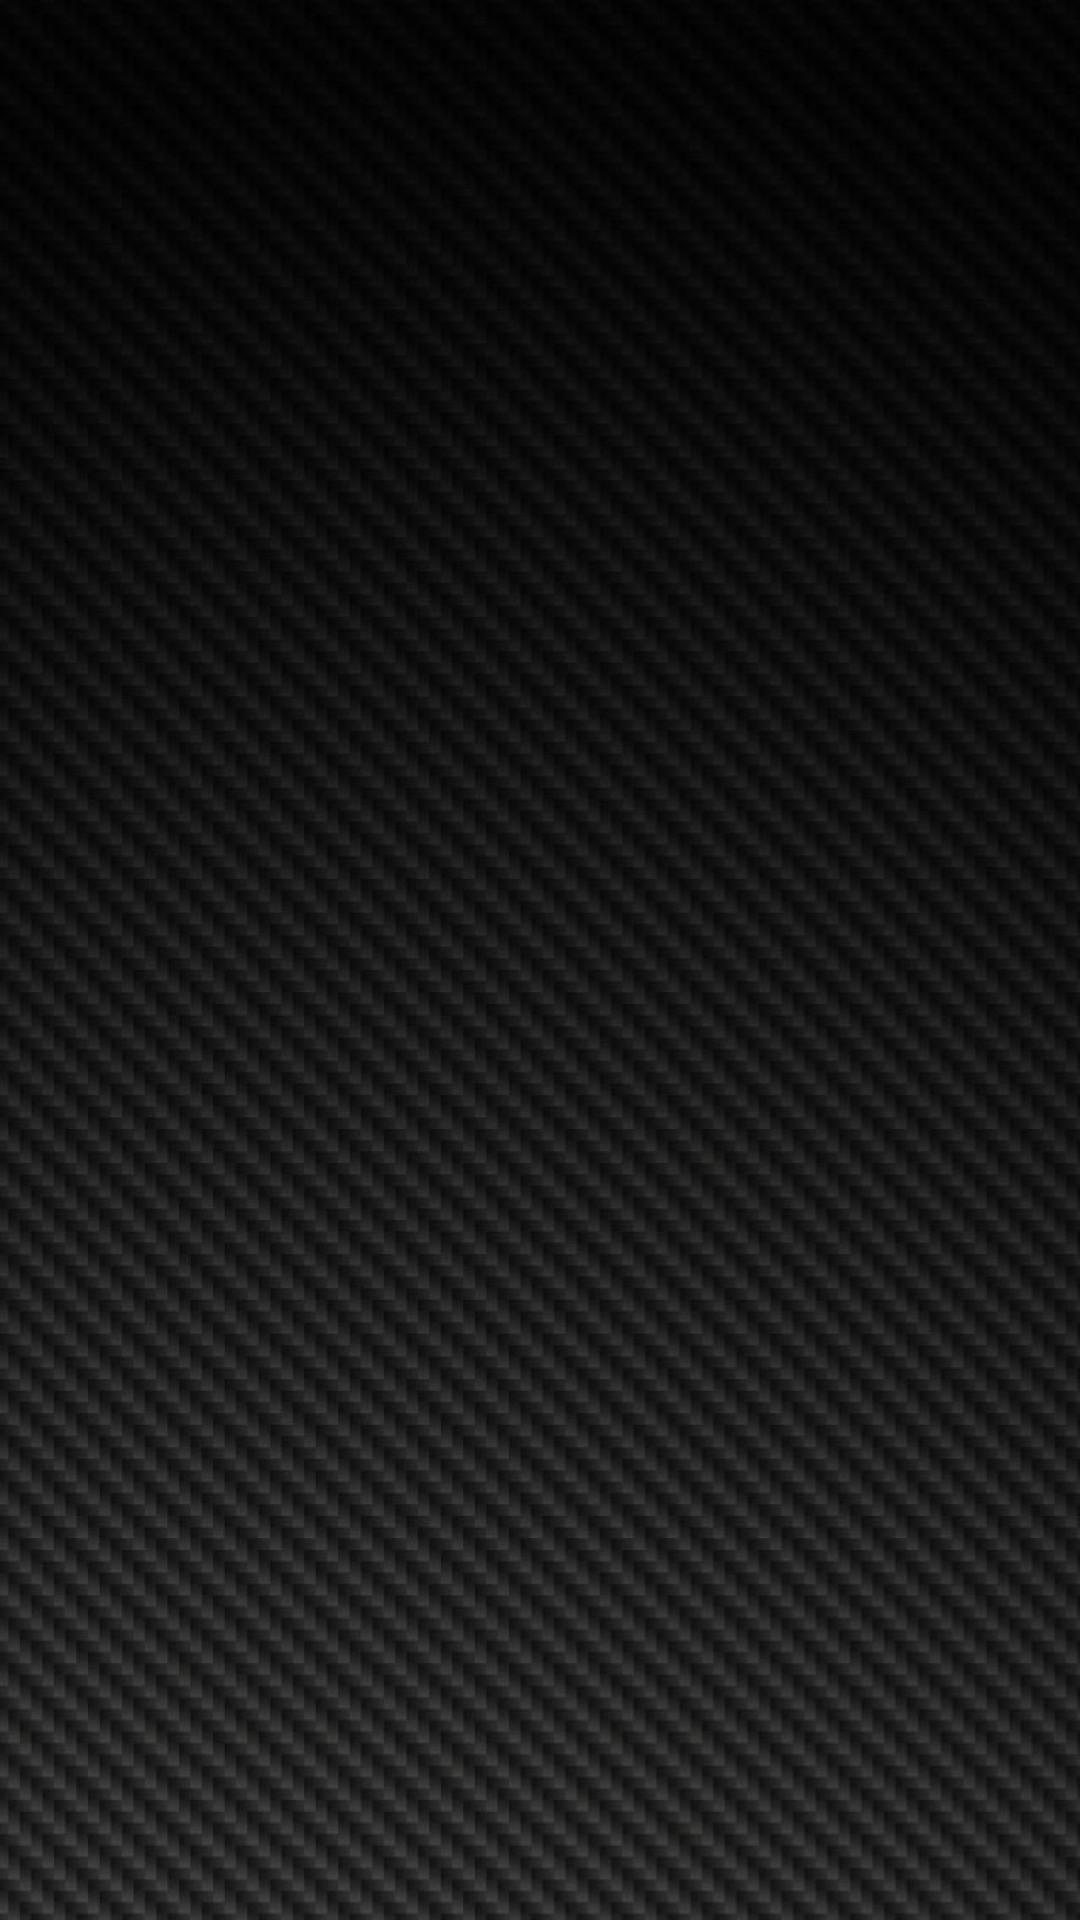 Dark Floral Iphone Wallpaper Carbon Fiber Iphone Wallpaper Hd Pixelstalk Net